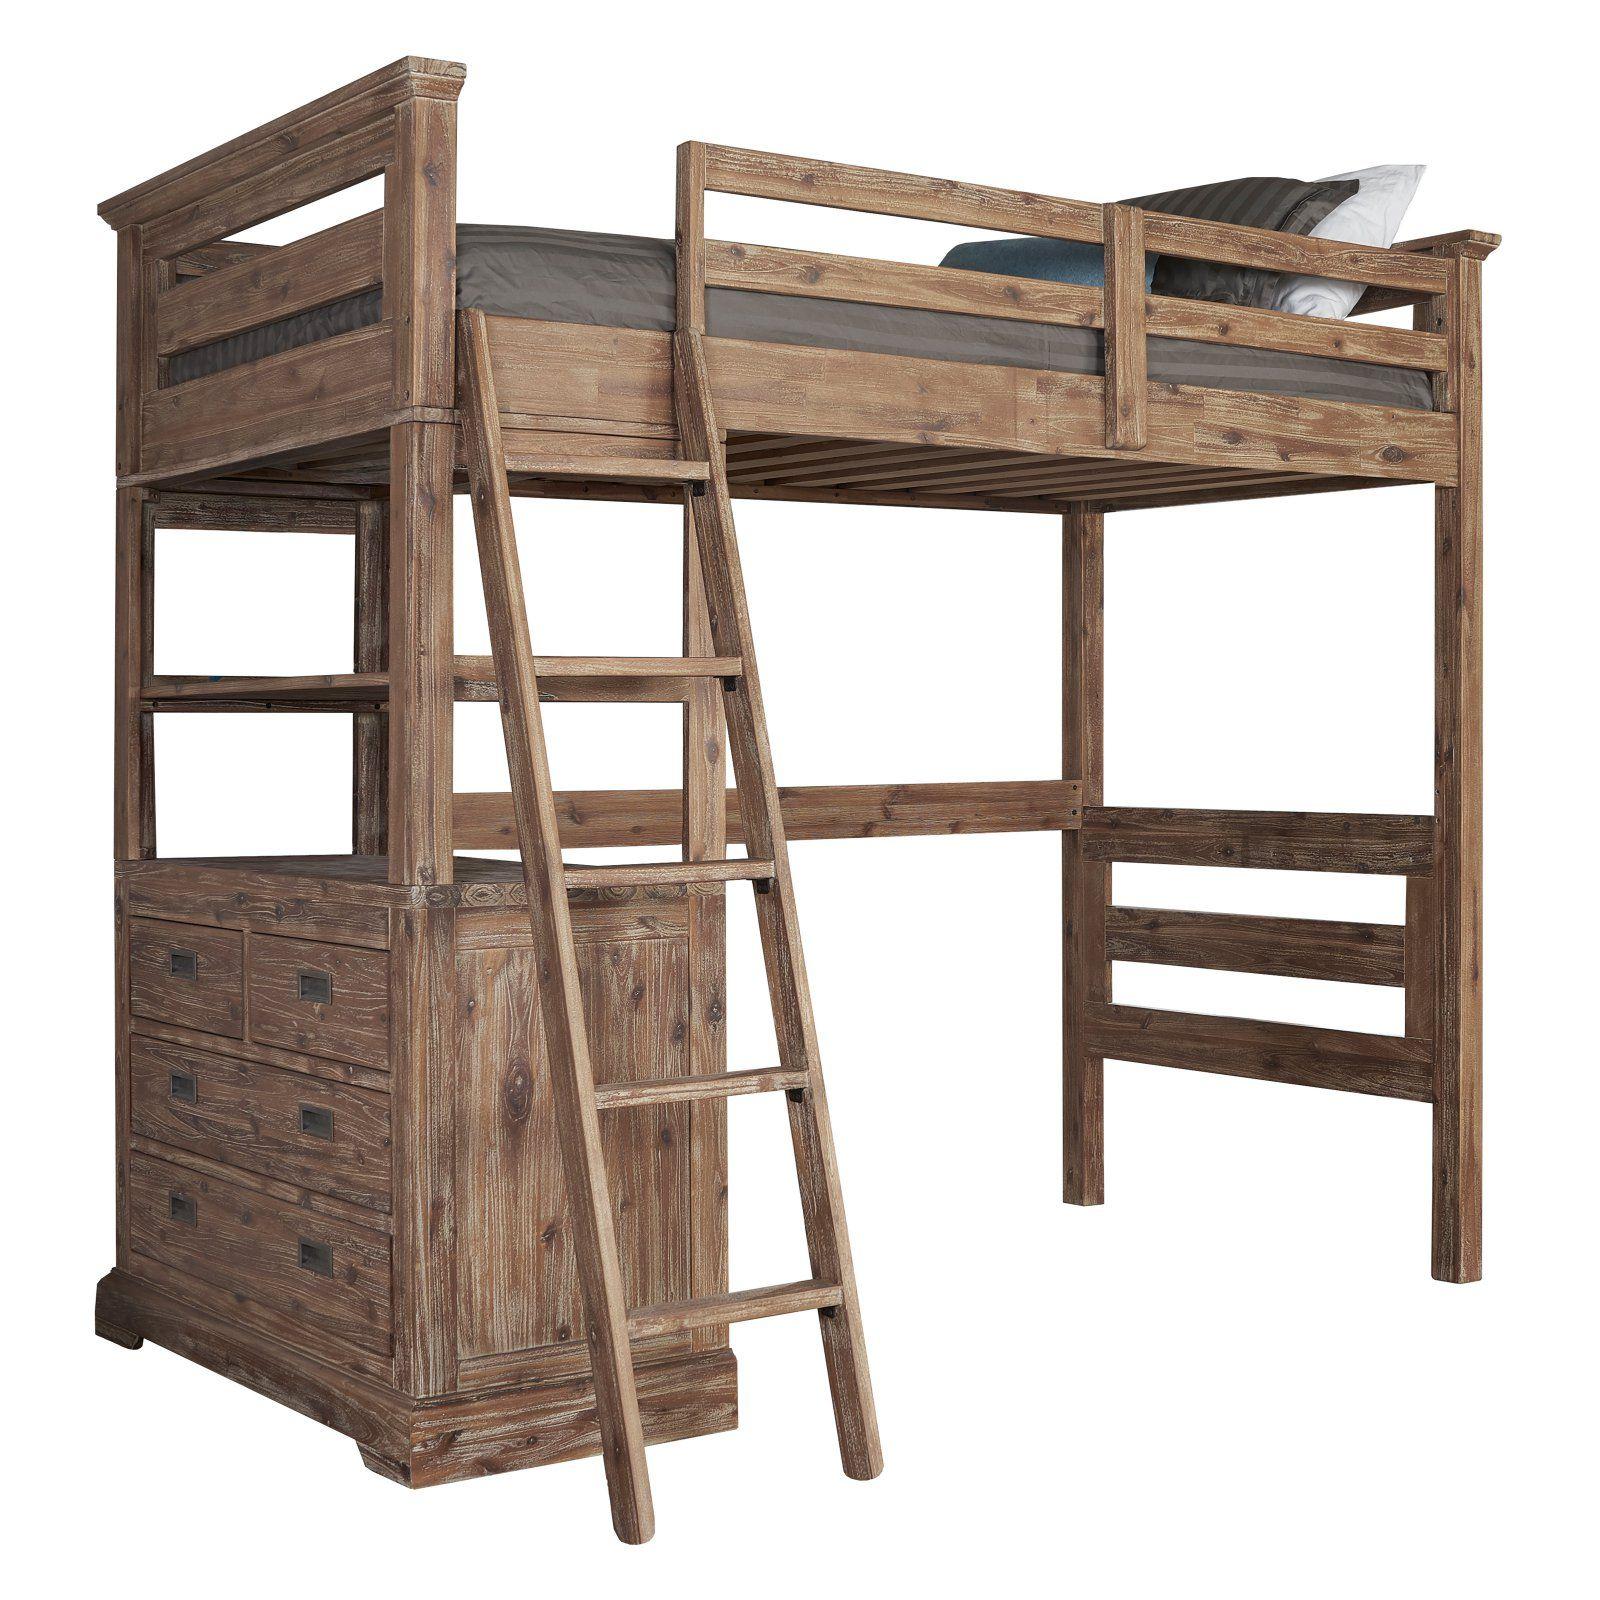 Hillsdale Furniture Caspian Study Loft With Images Twin Loft Bed Loft Bed Loft Bed Frame